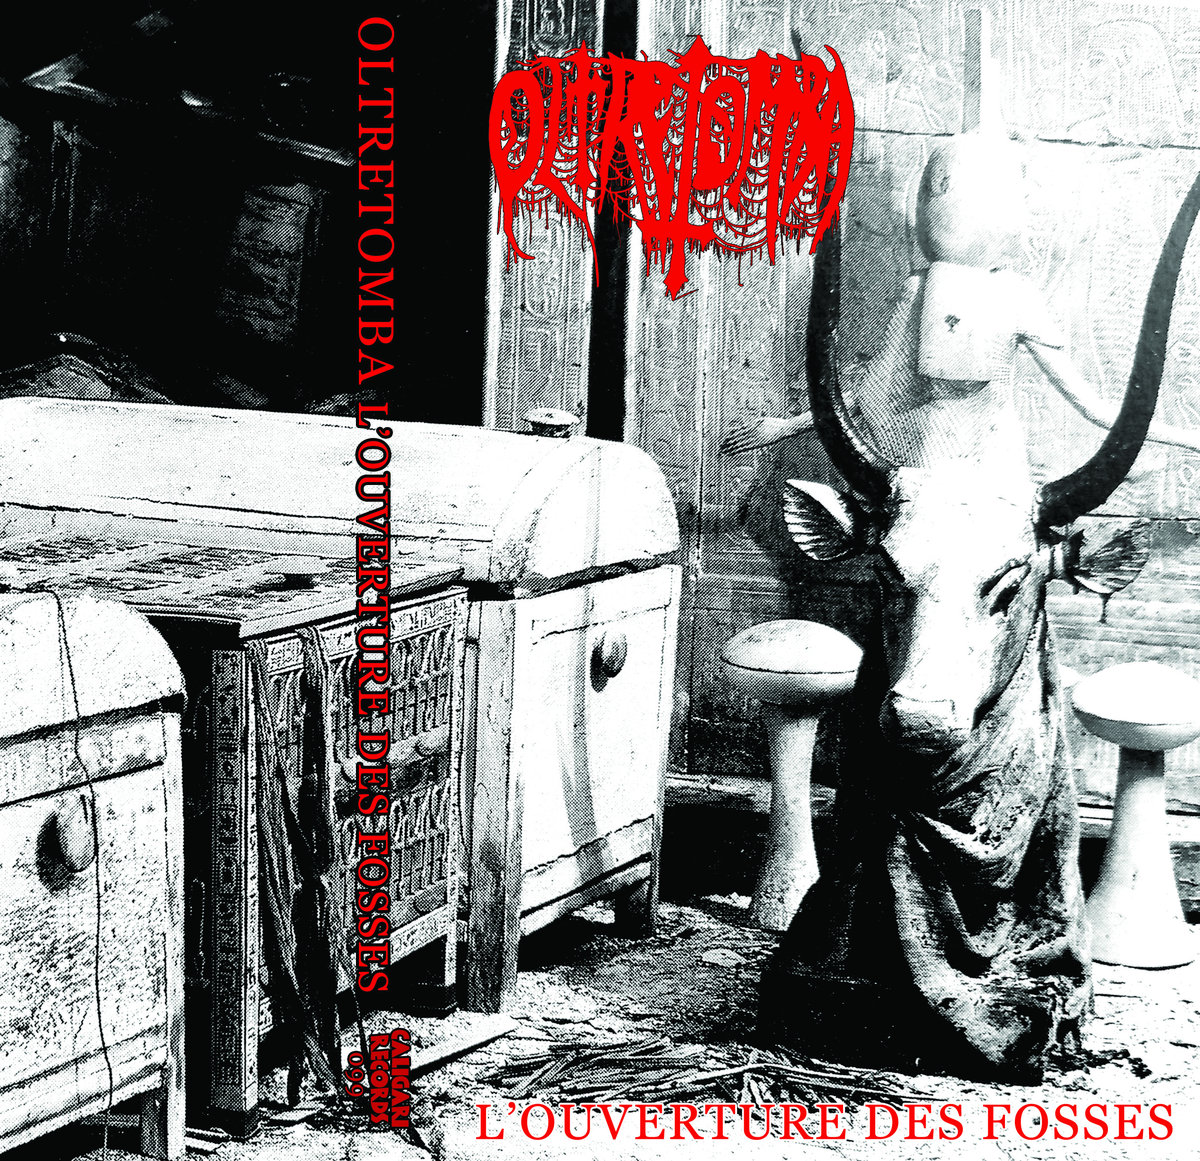 Oltretomba - L'Ouverture Des Fosses  (Caligari Records, 2018)